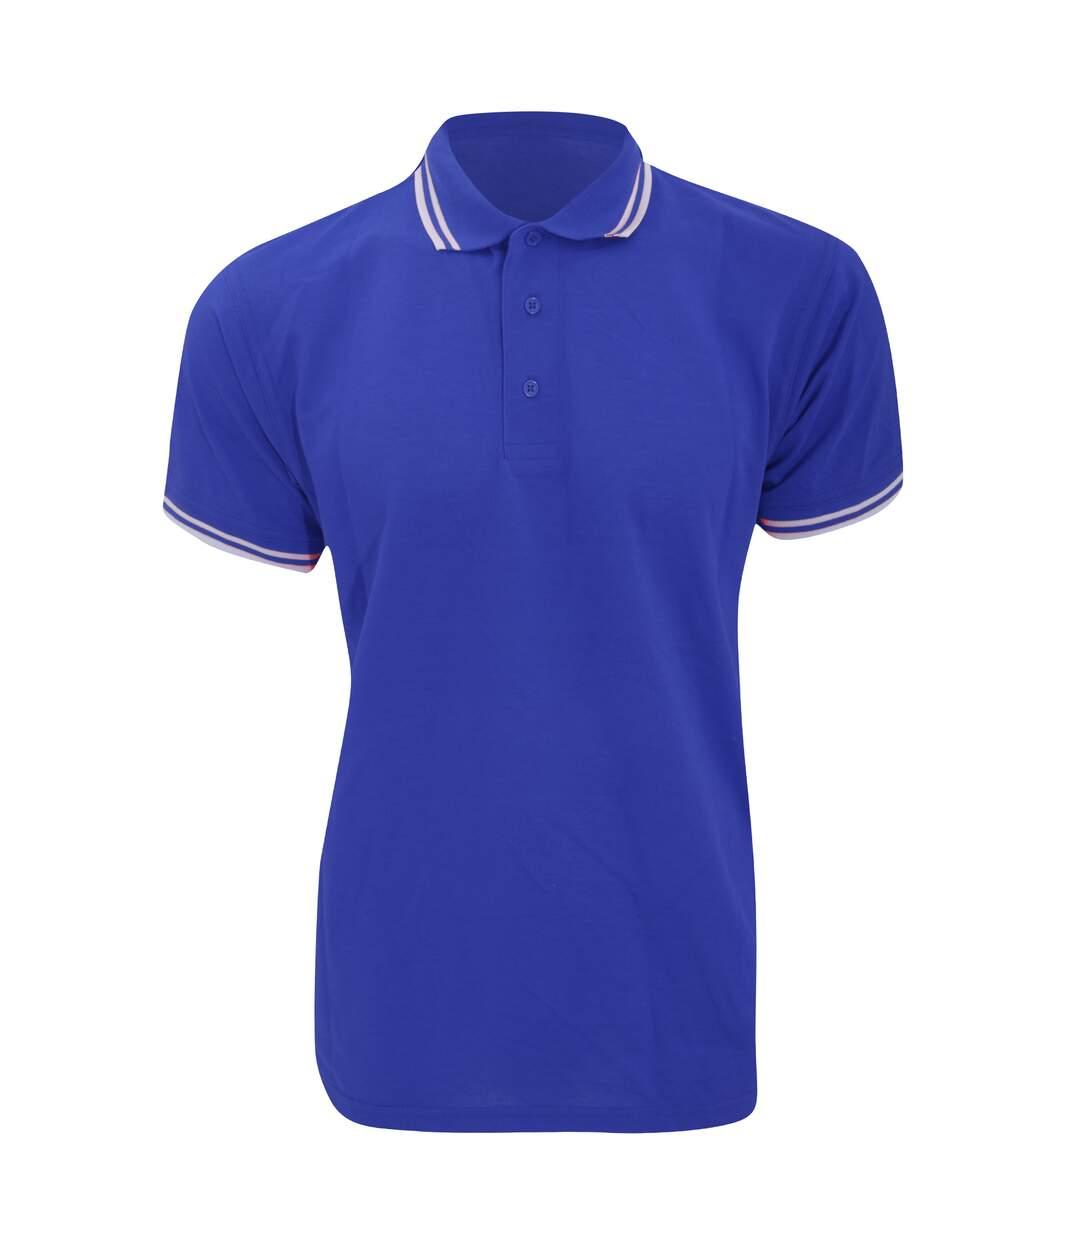 Kustom Kit Mens Tipped Piqué Short Sleeve Polo Shirt (Royal/White) - UTBC613